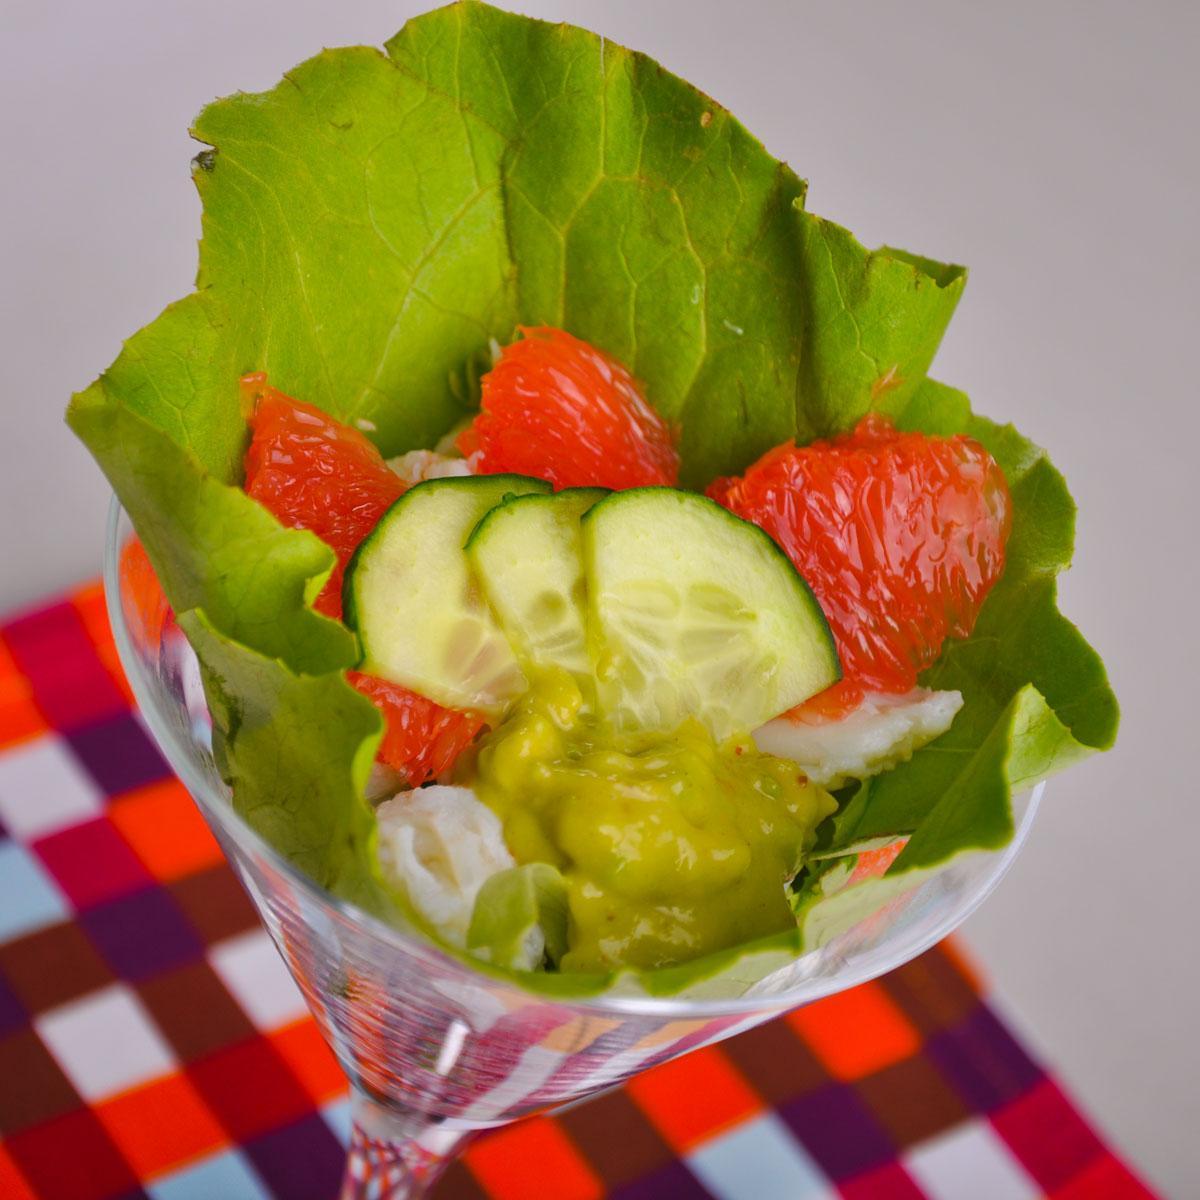 recette coupe de salade de crabe cuisine madame figaro. Black Bedroom Furniture Sets. Home Design Ideas